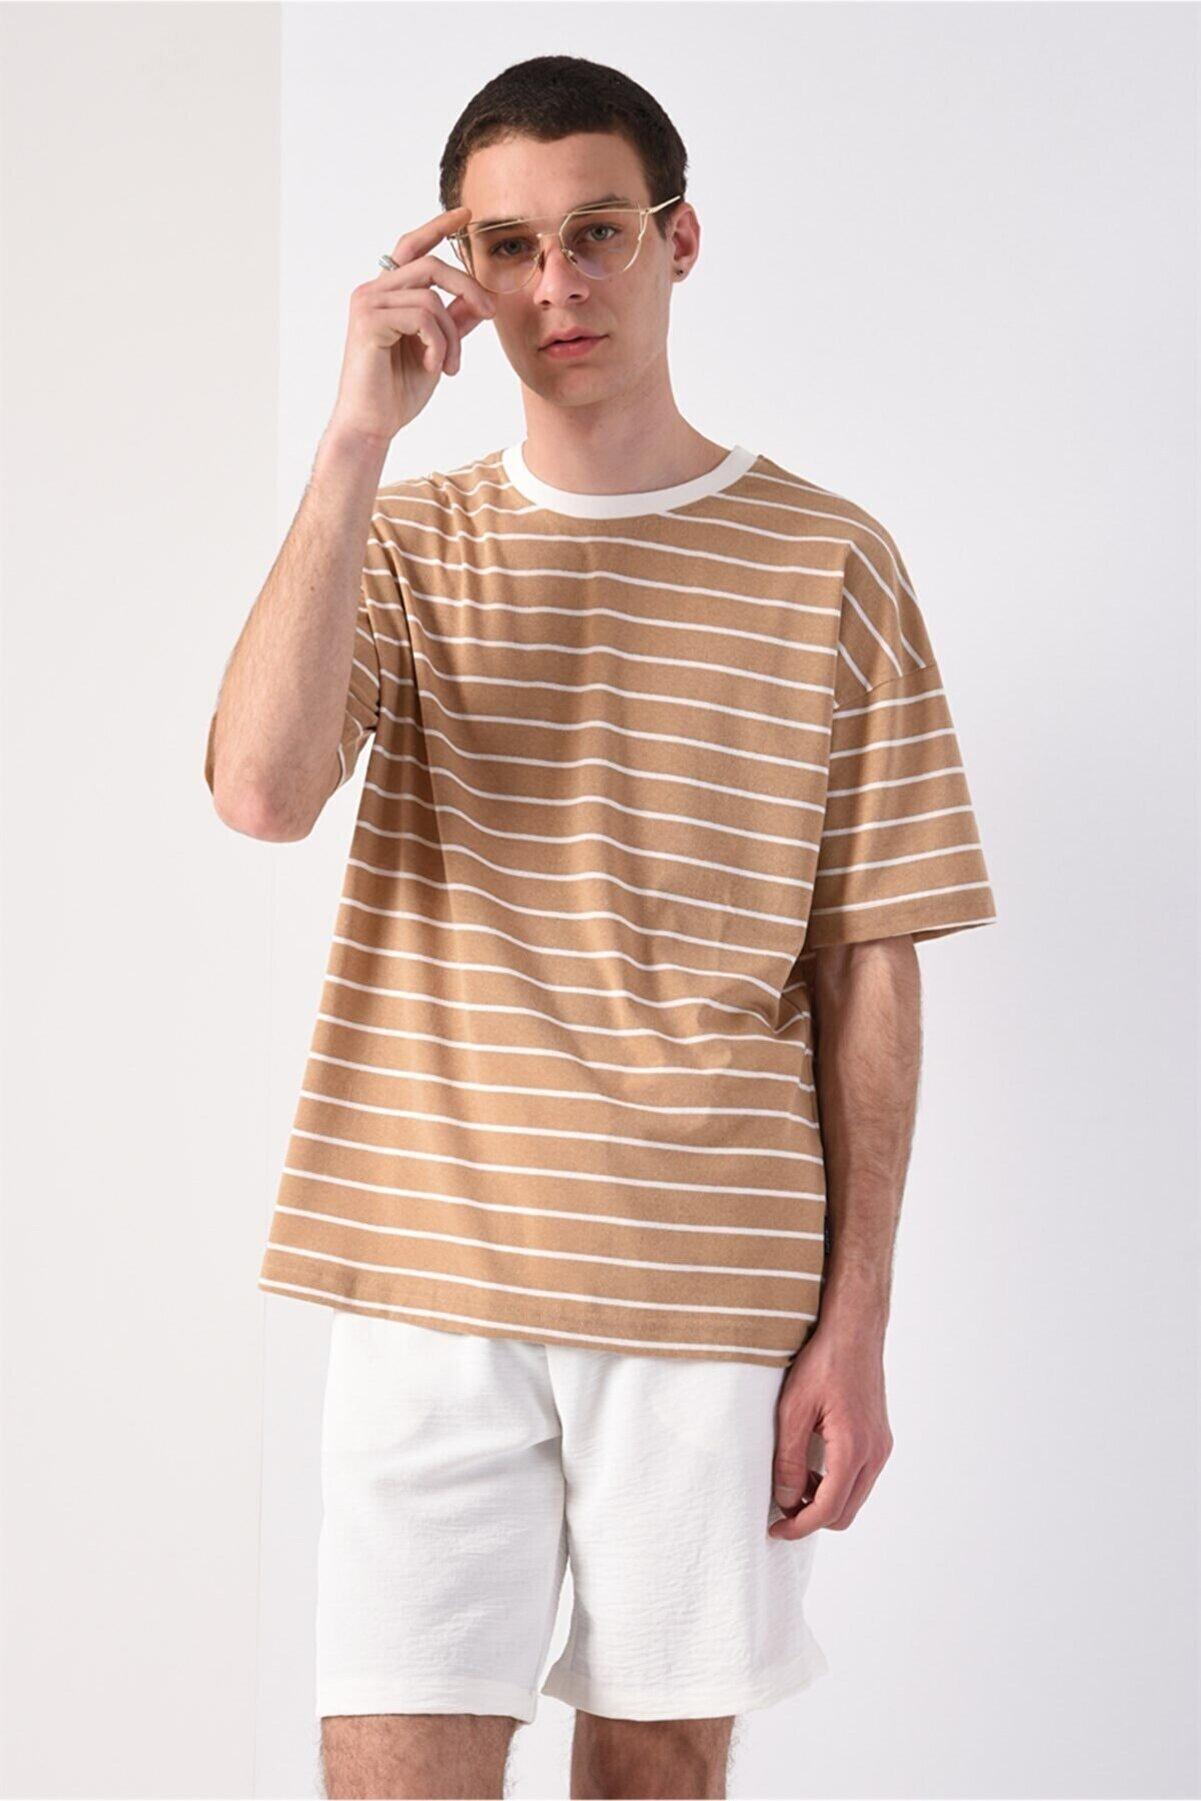 Antioch Men Bej Oversize Çizgili T-shirt